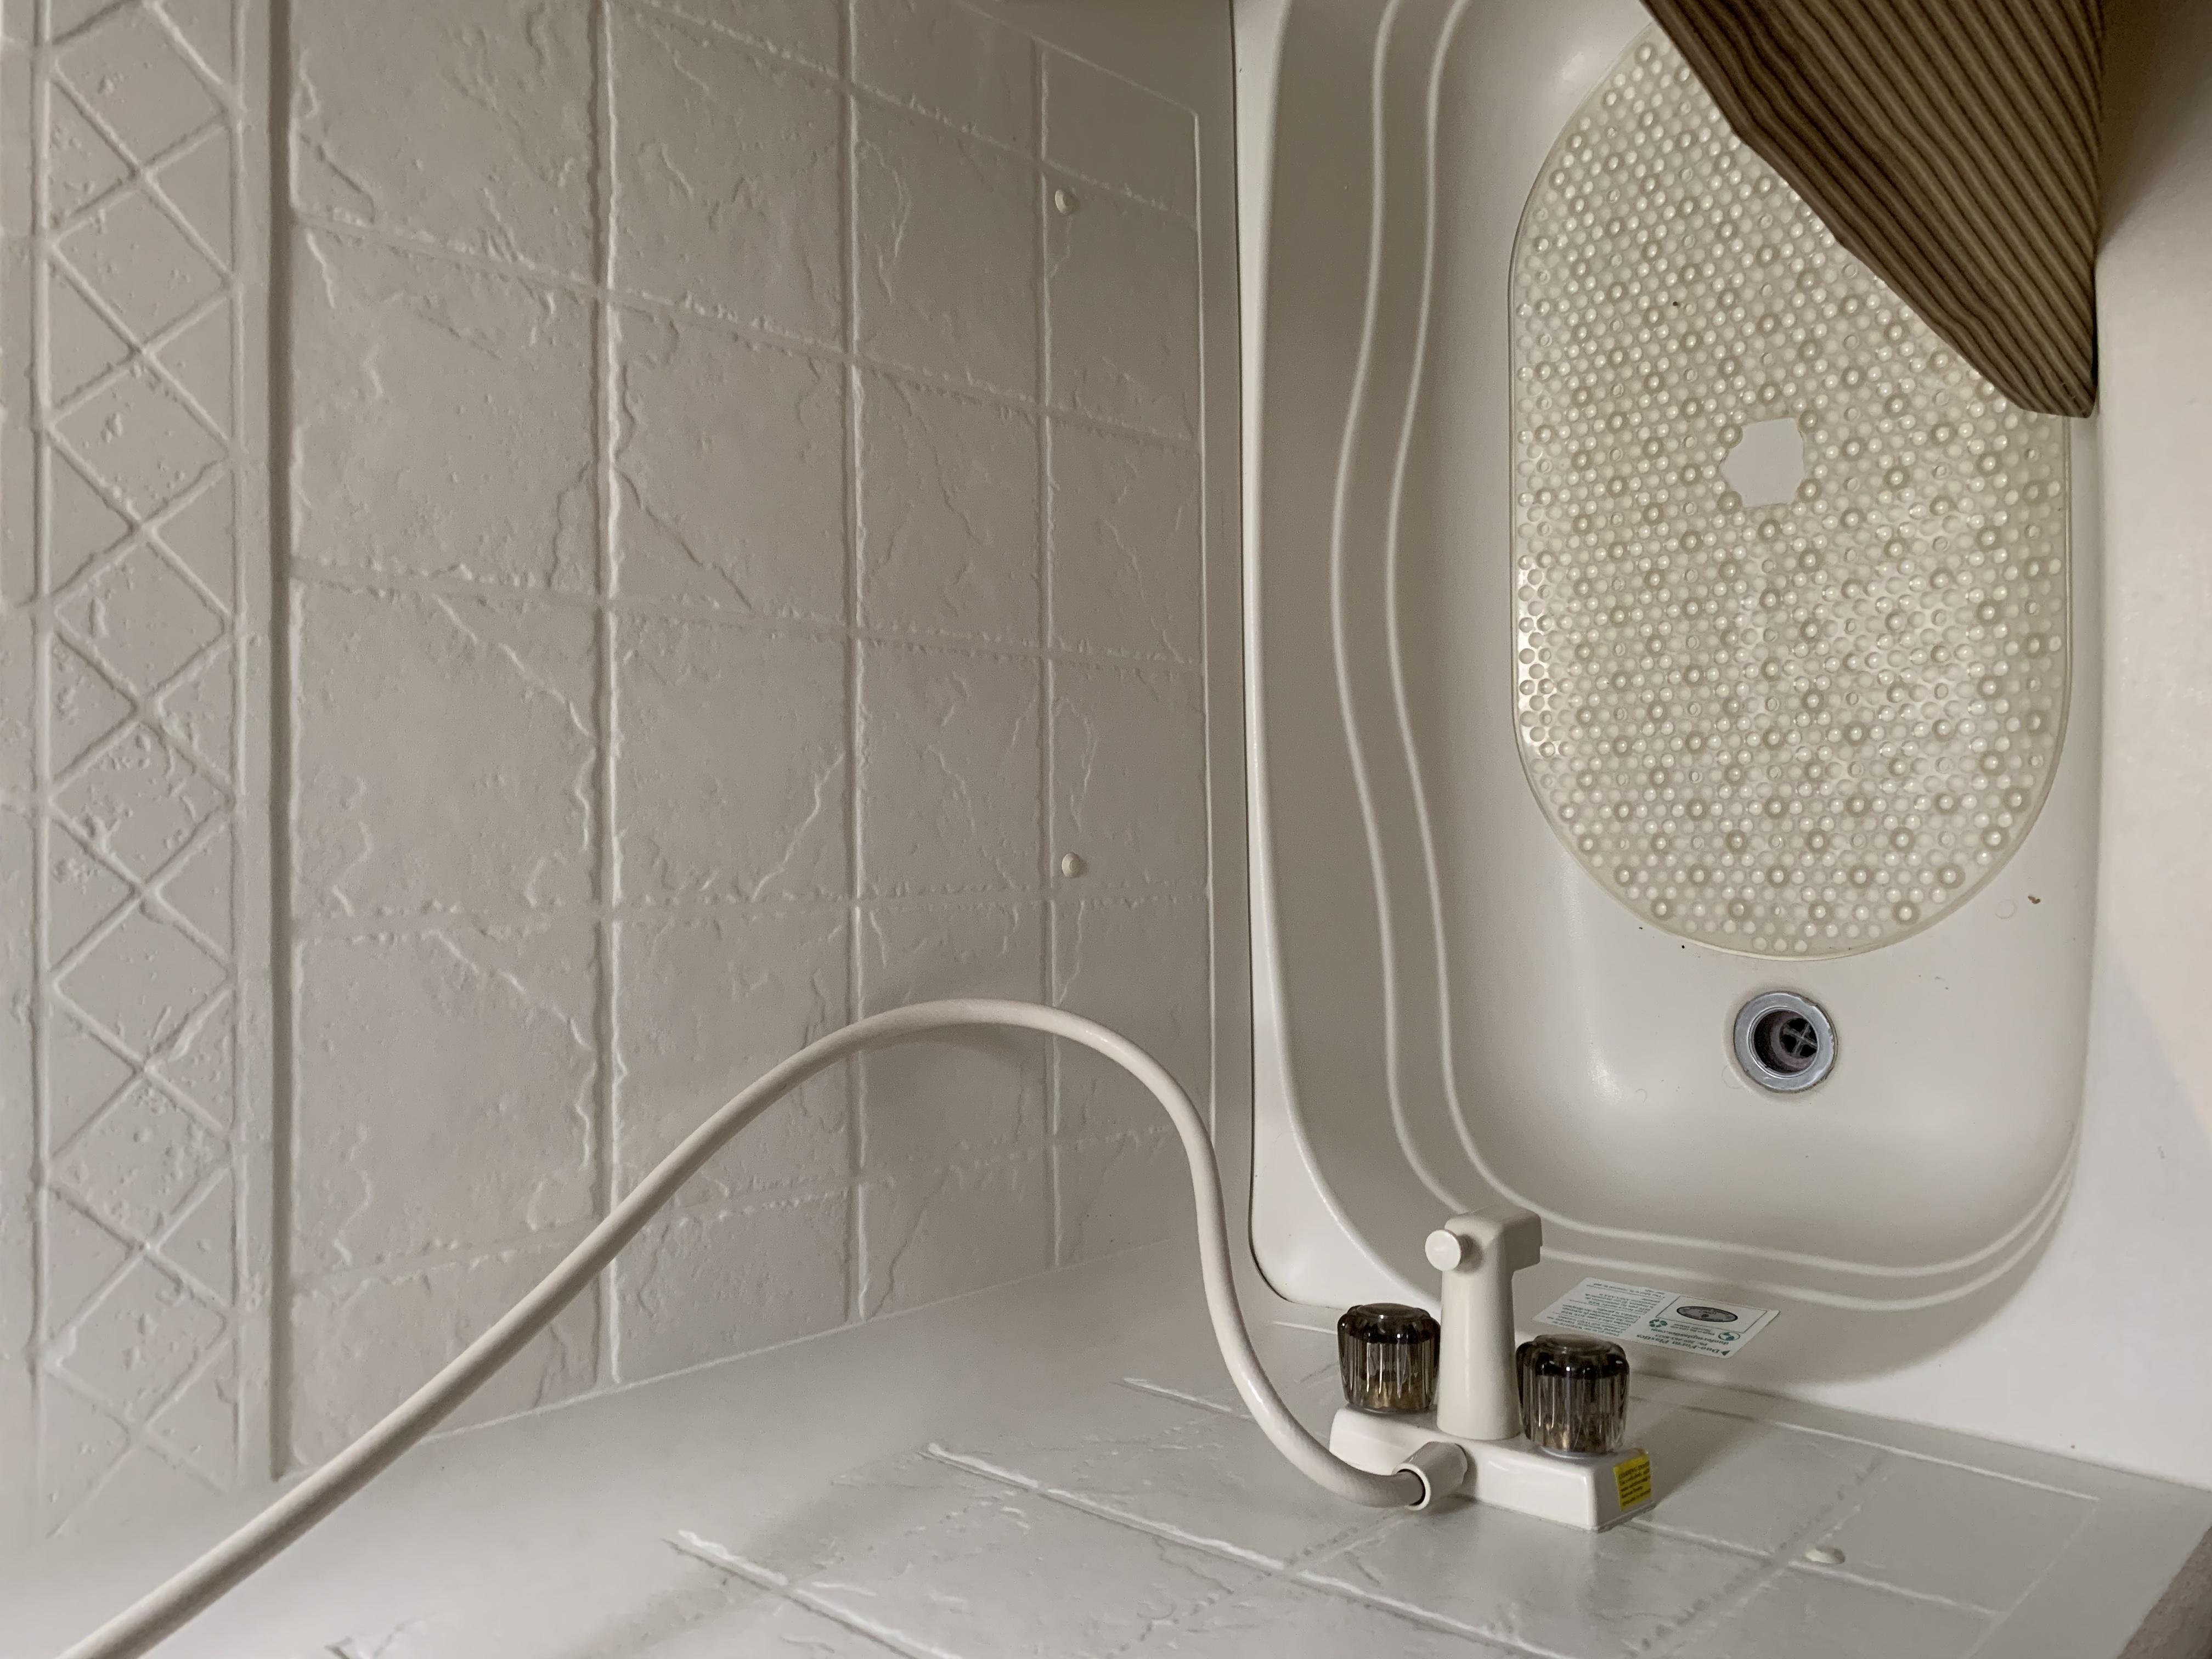 Shower/tub combk. Jayco JayFlight 2015